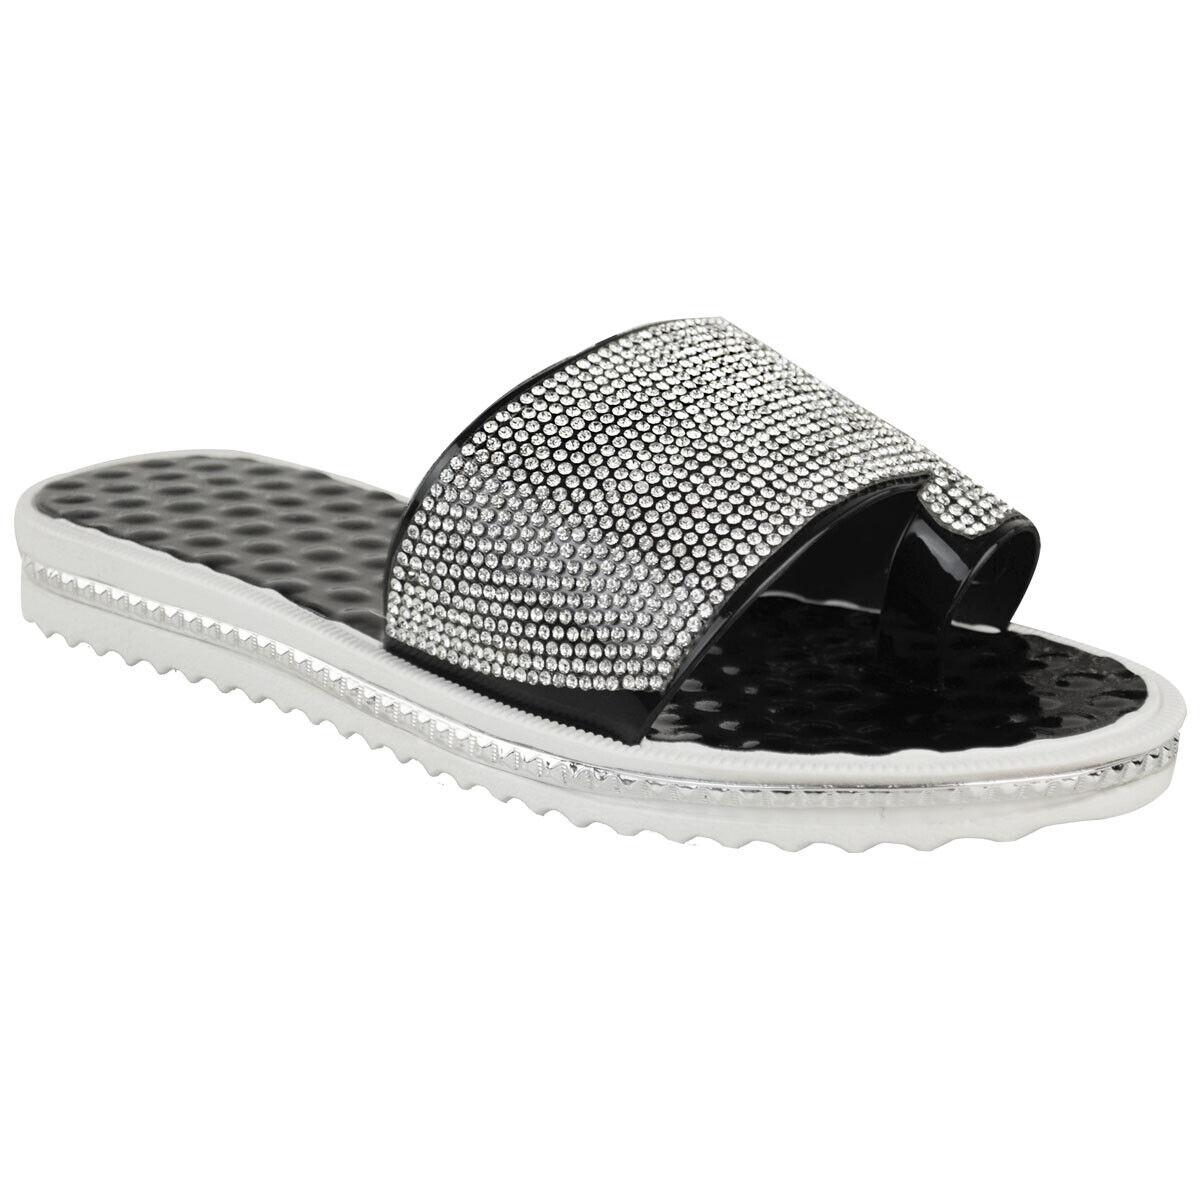 6b3ea3f9acd1 Details about Ladies Women Summer Beach Gem Diamante Sliders FlipFlop Sandals  Jelly Shoes Size